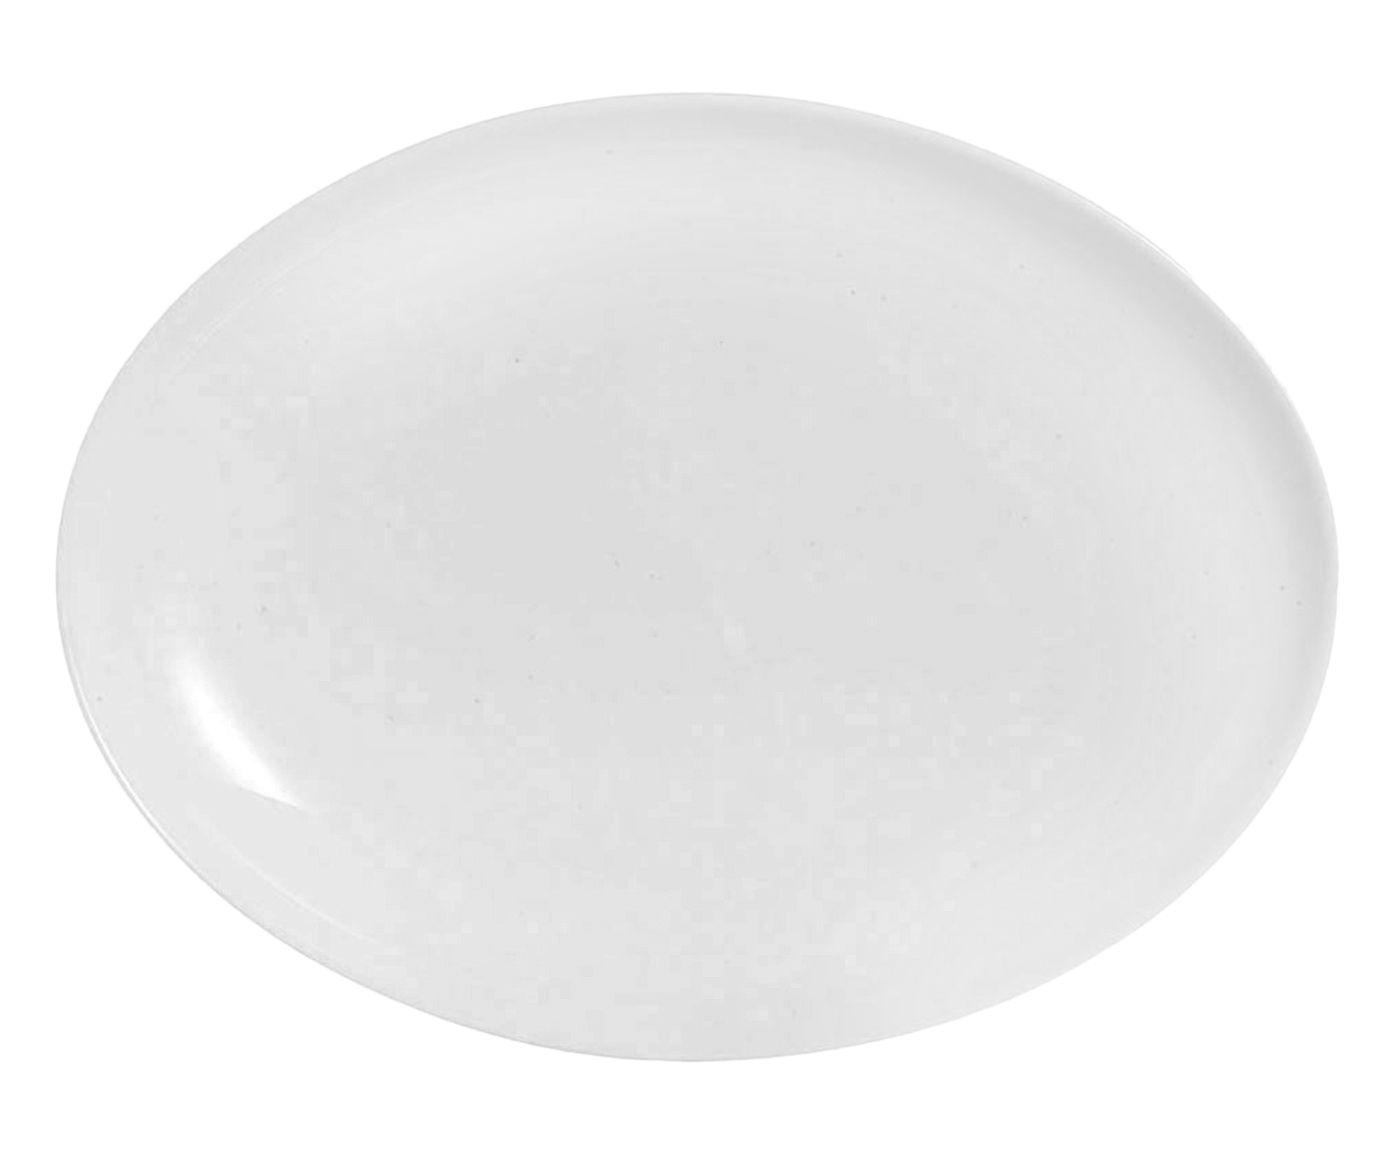 Prato para Servir Diwali Branco - 25X33cm | Westwing.com.br